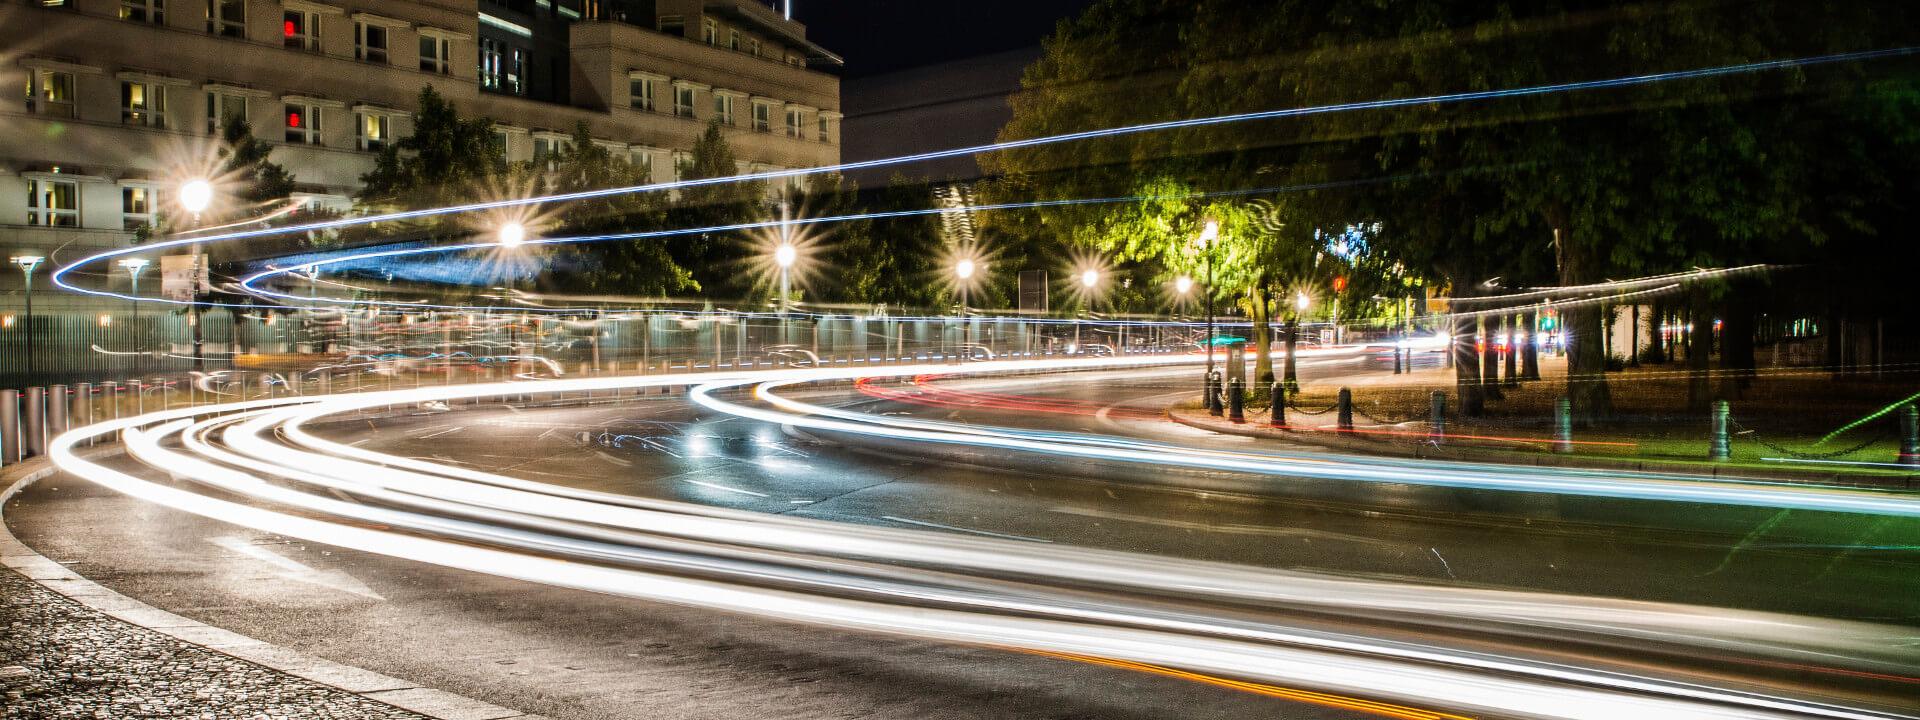 abend-autobahn-autos